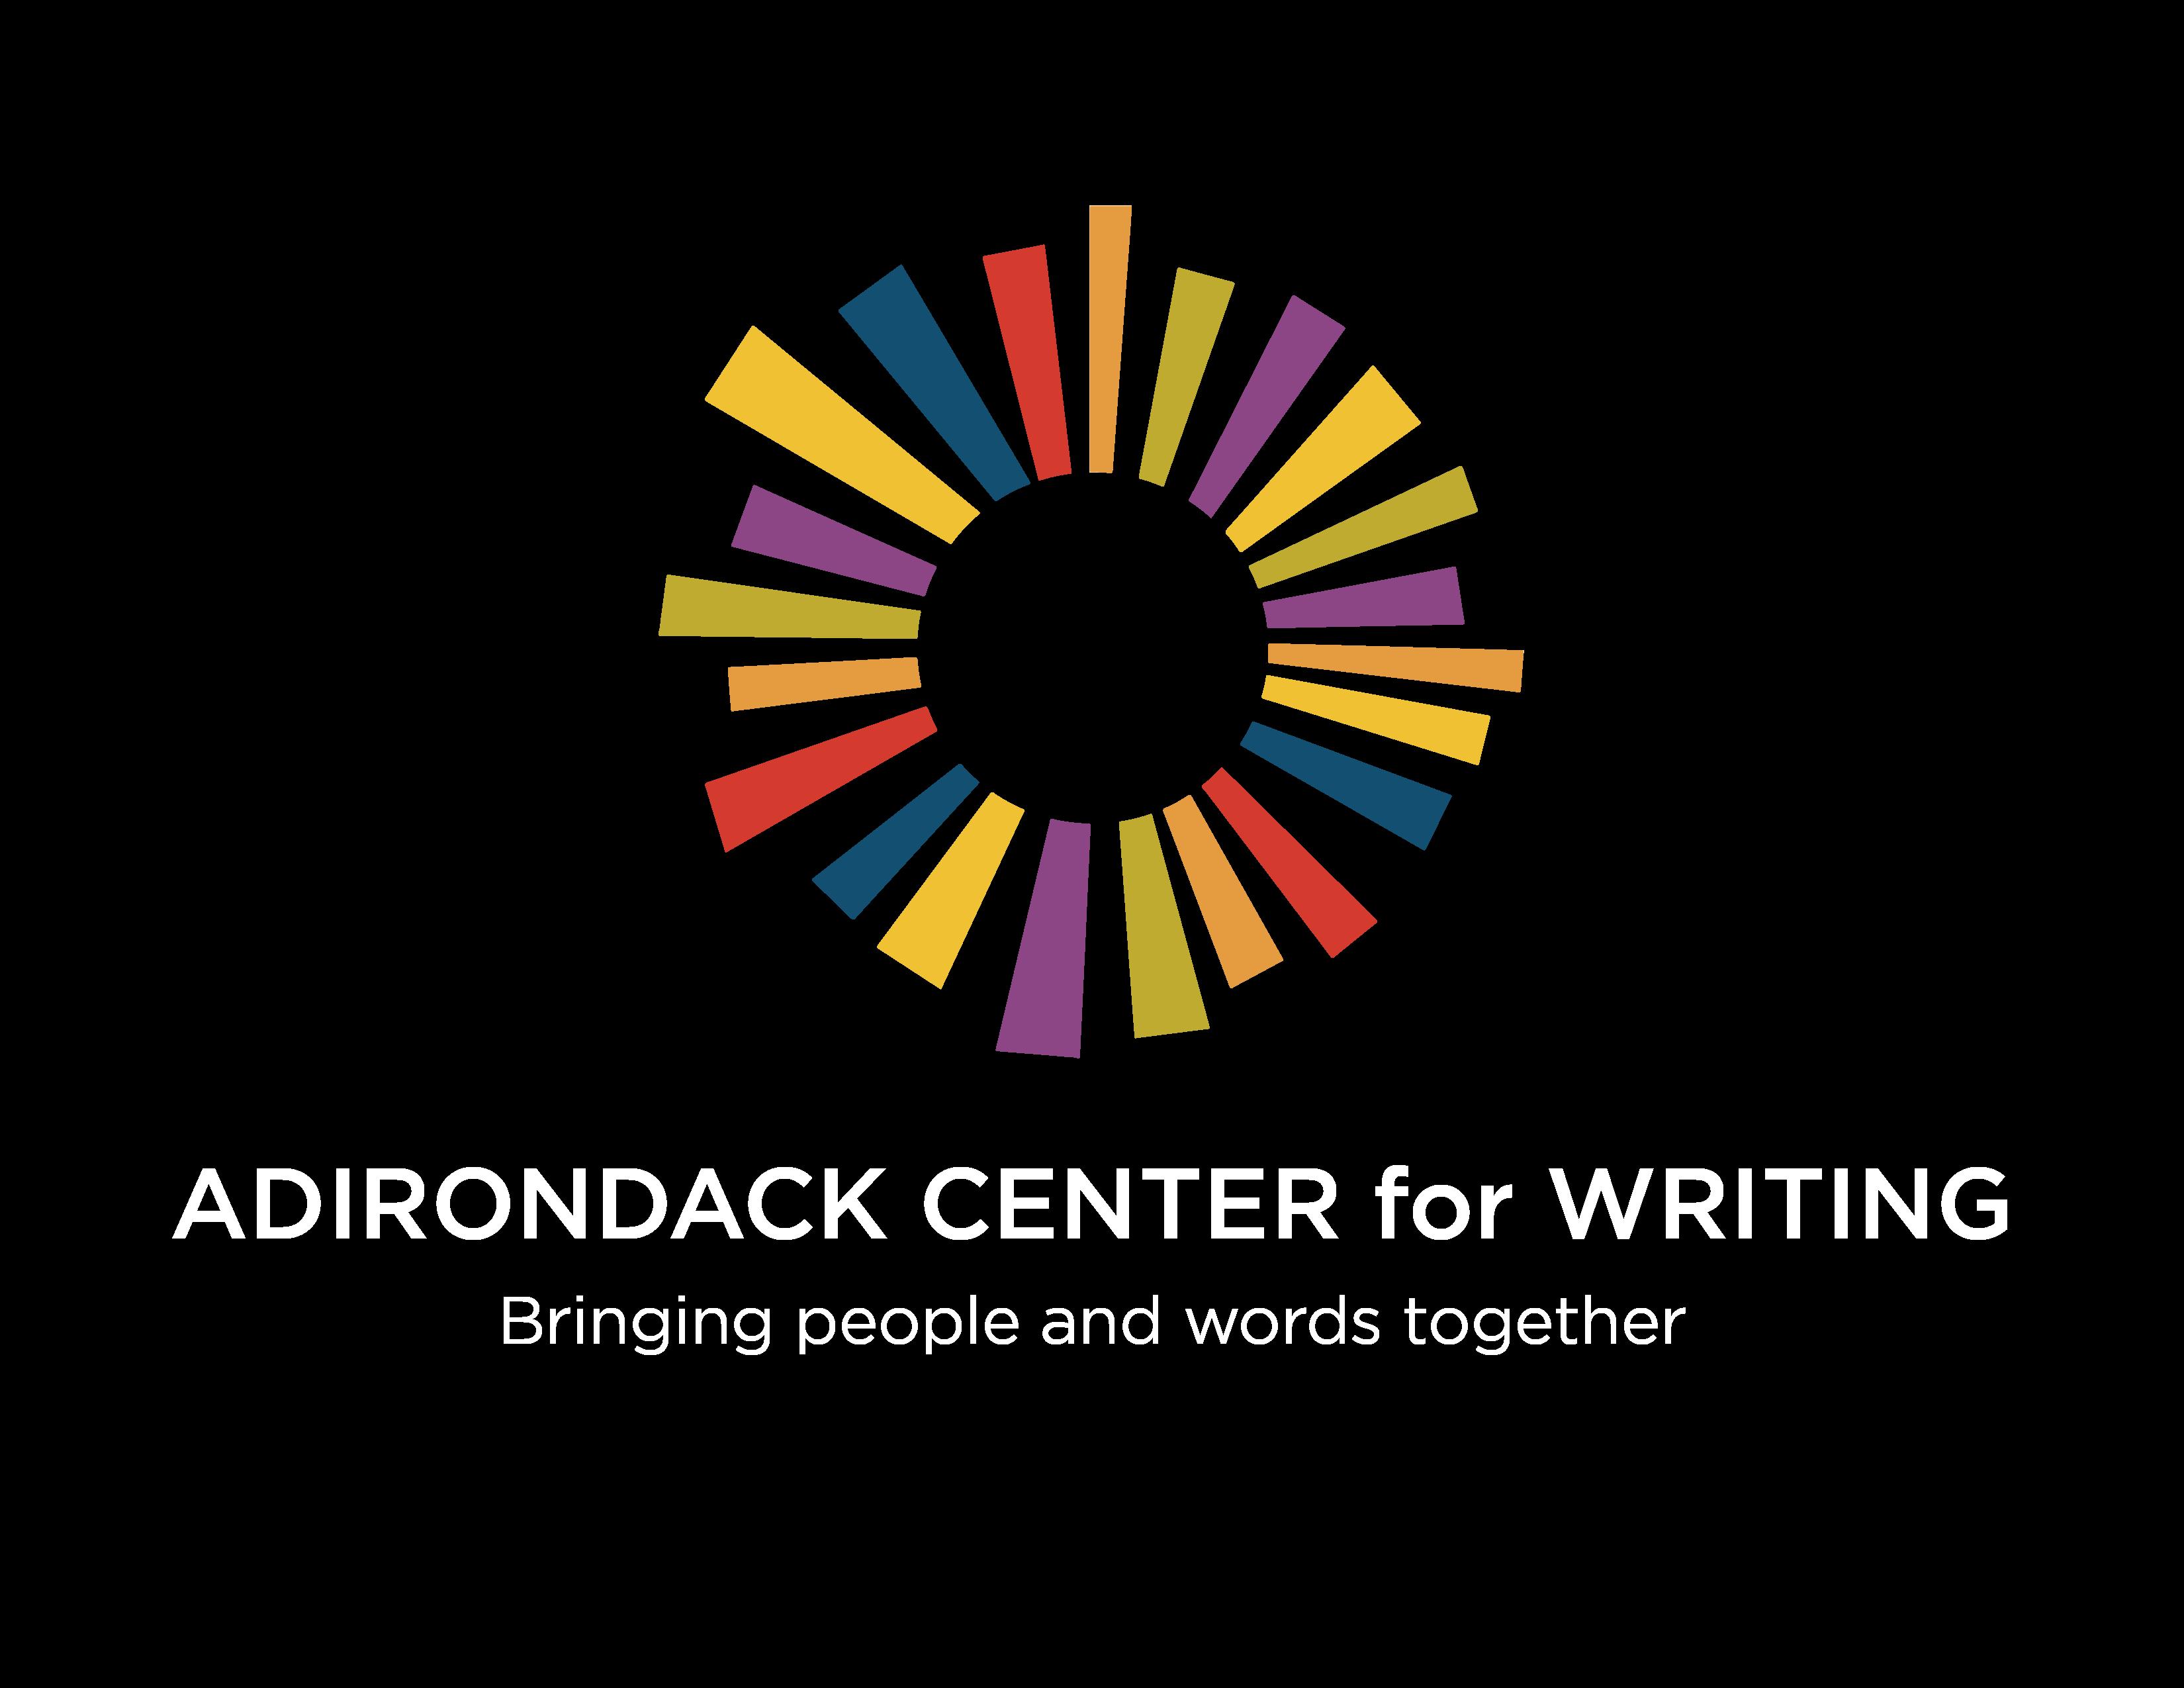 Adirondack Center for Writing